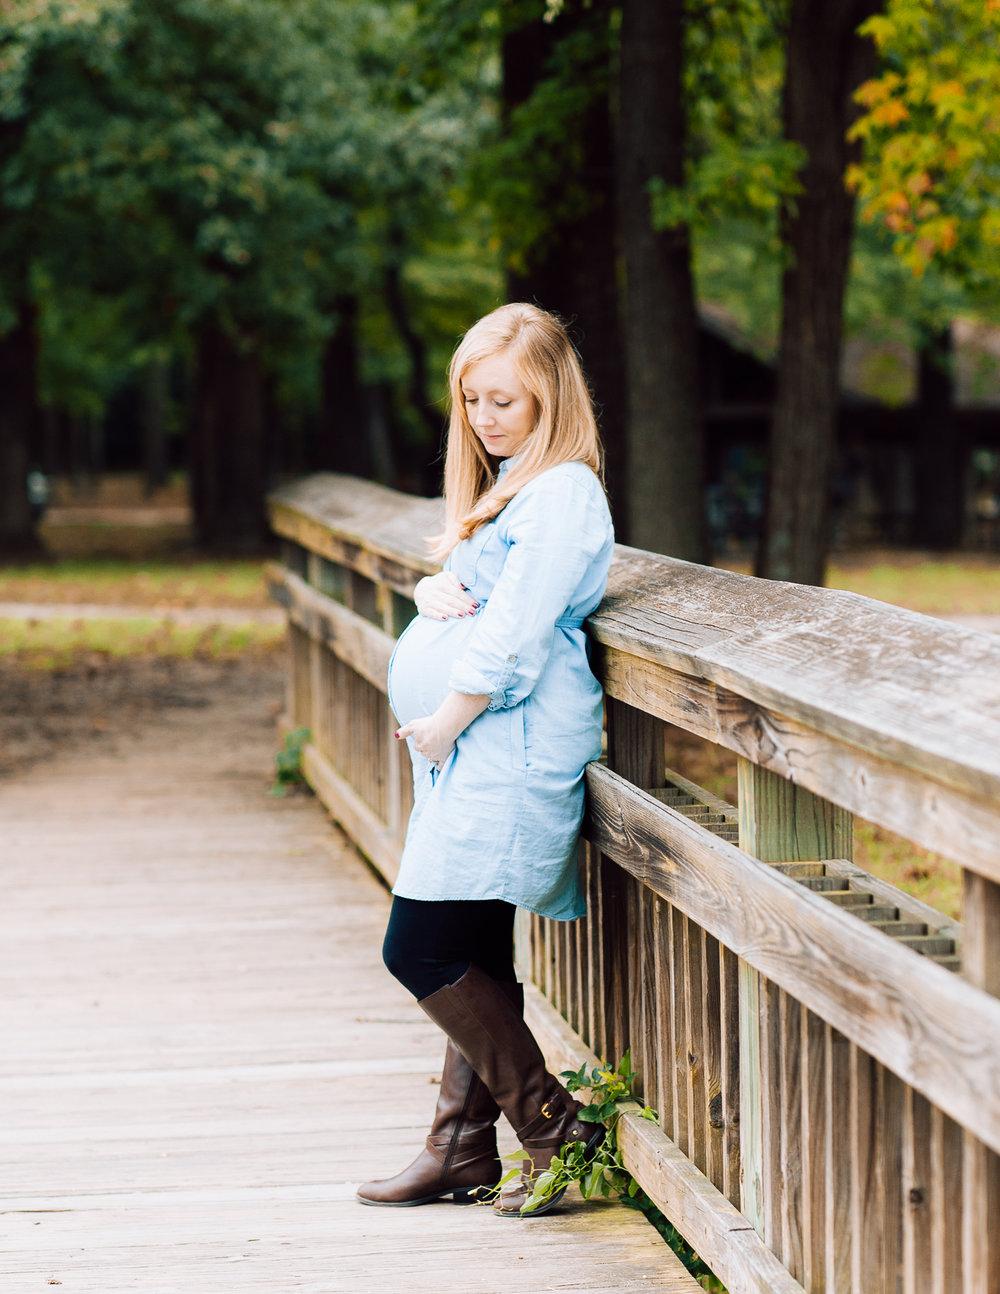 maternity_fallphotos_fredericksburgphotographer_leesylvania_youseephotography_Heather (13).jpg